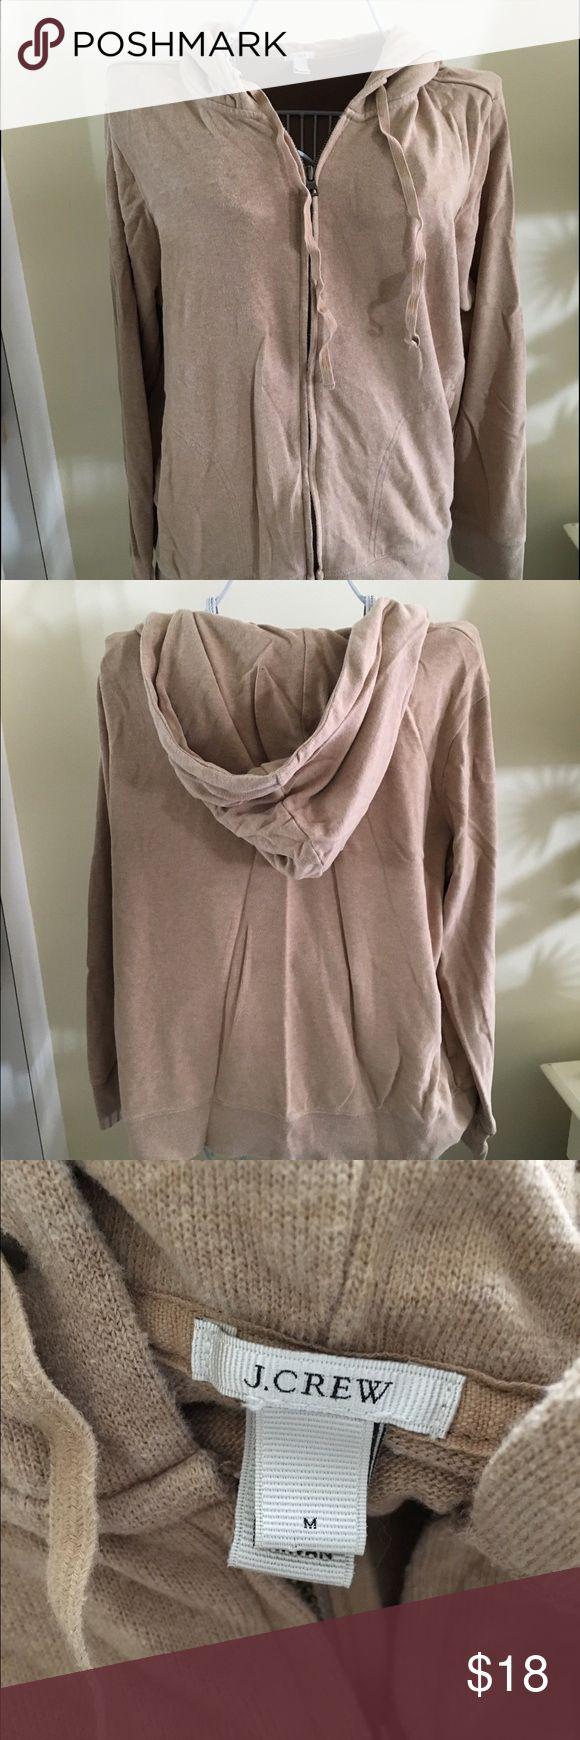 J.Crew Camel Hoodie Cotton zip up hoodie. Camel color. Size medium but runs large. Heavier weight. J. Crew Tops Sweatshirts & Hoodies